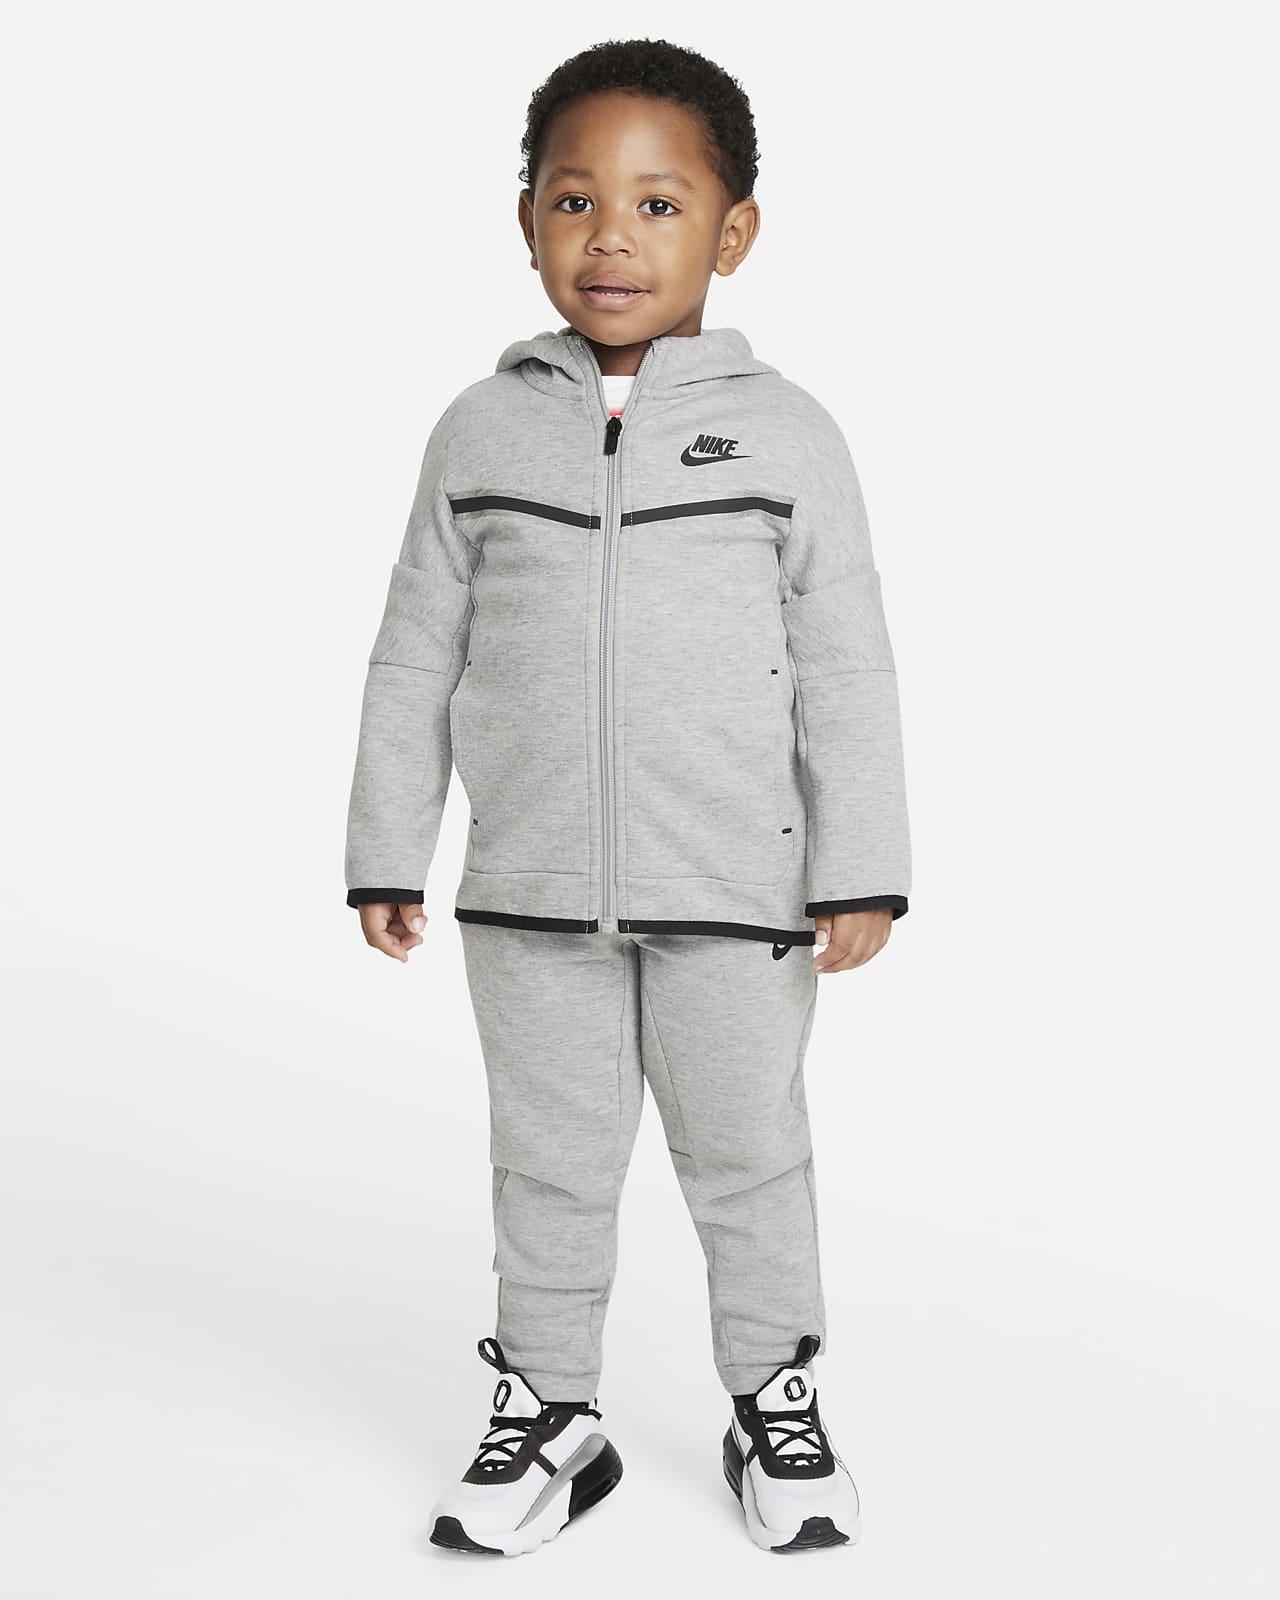 Nike Sportswear Tech Fleece Toddler Hoodie and Trousers Set